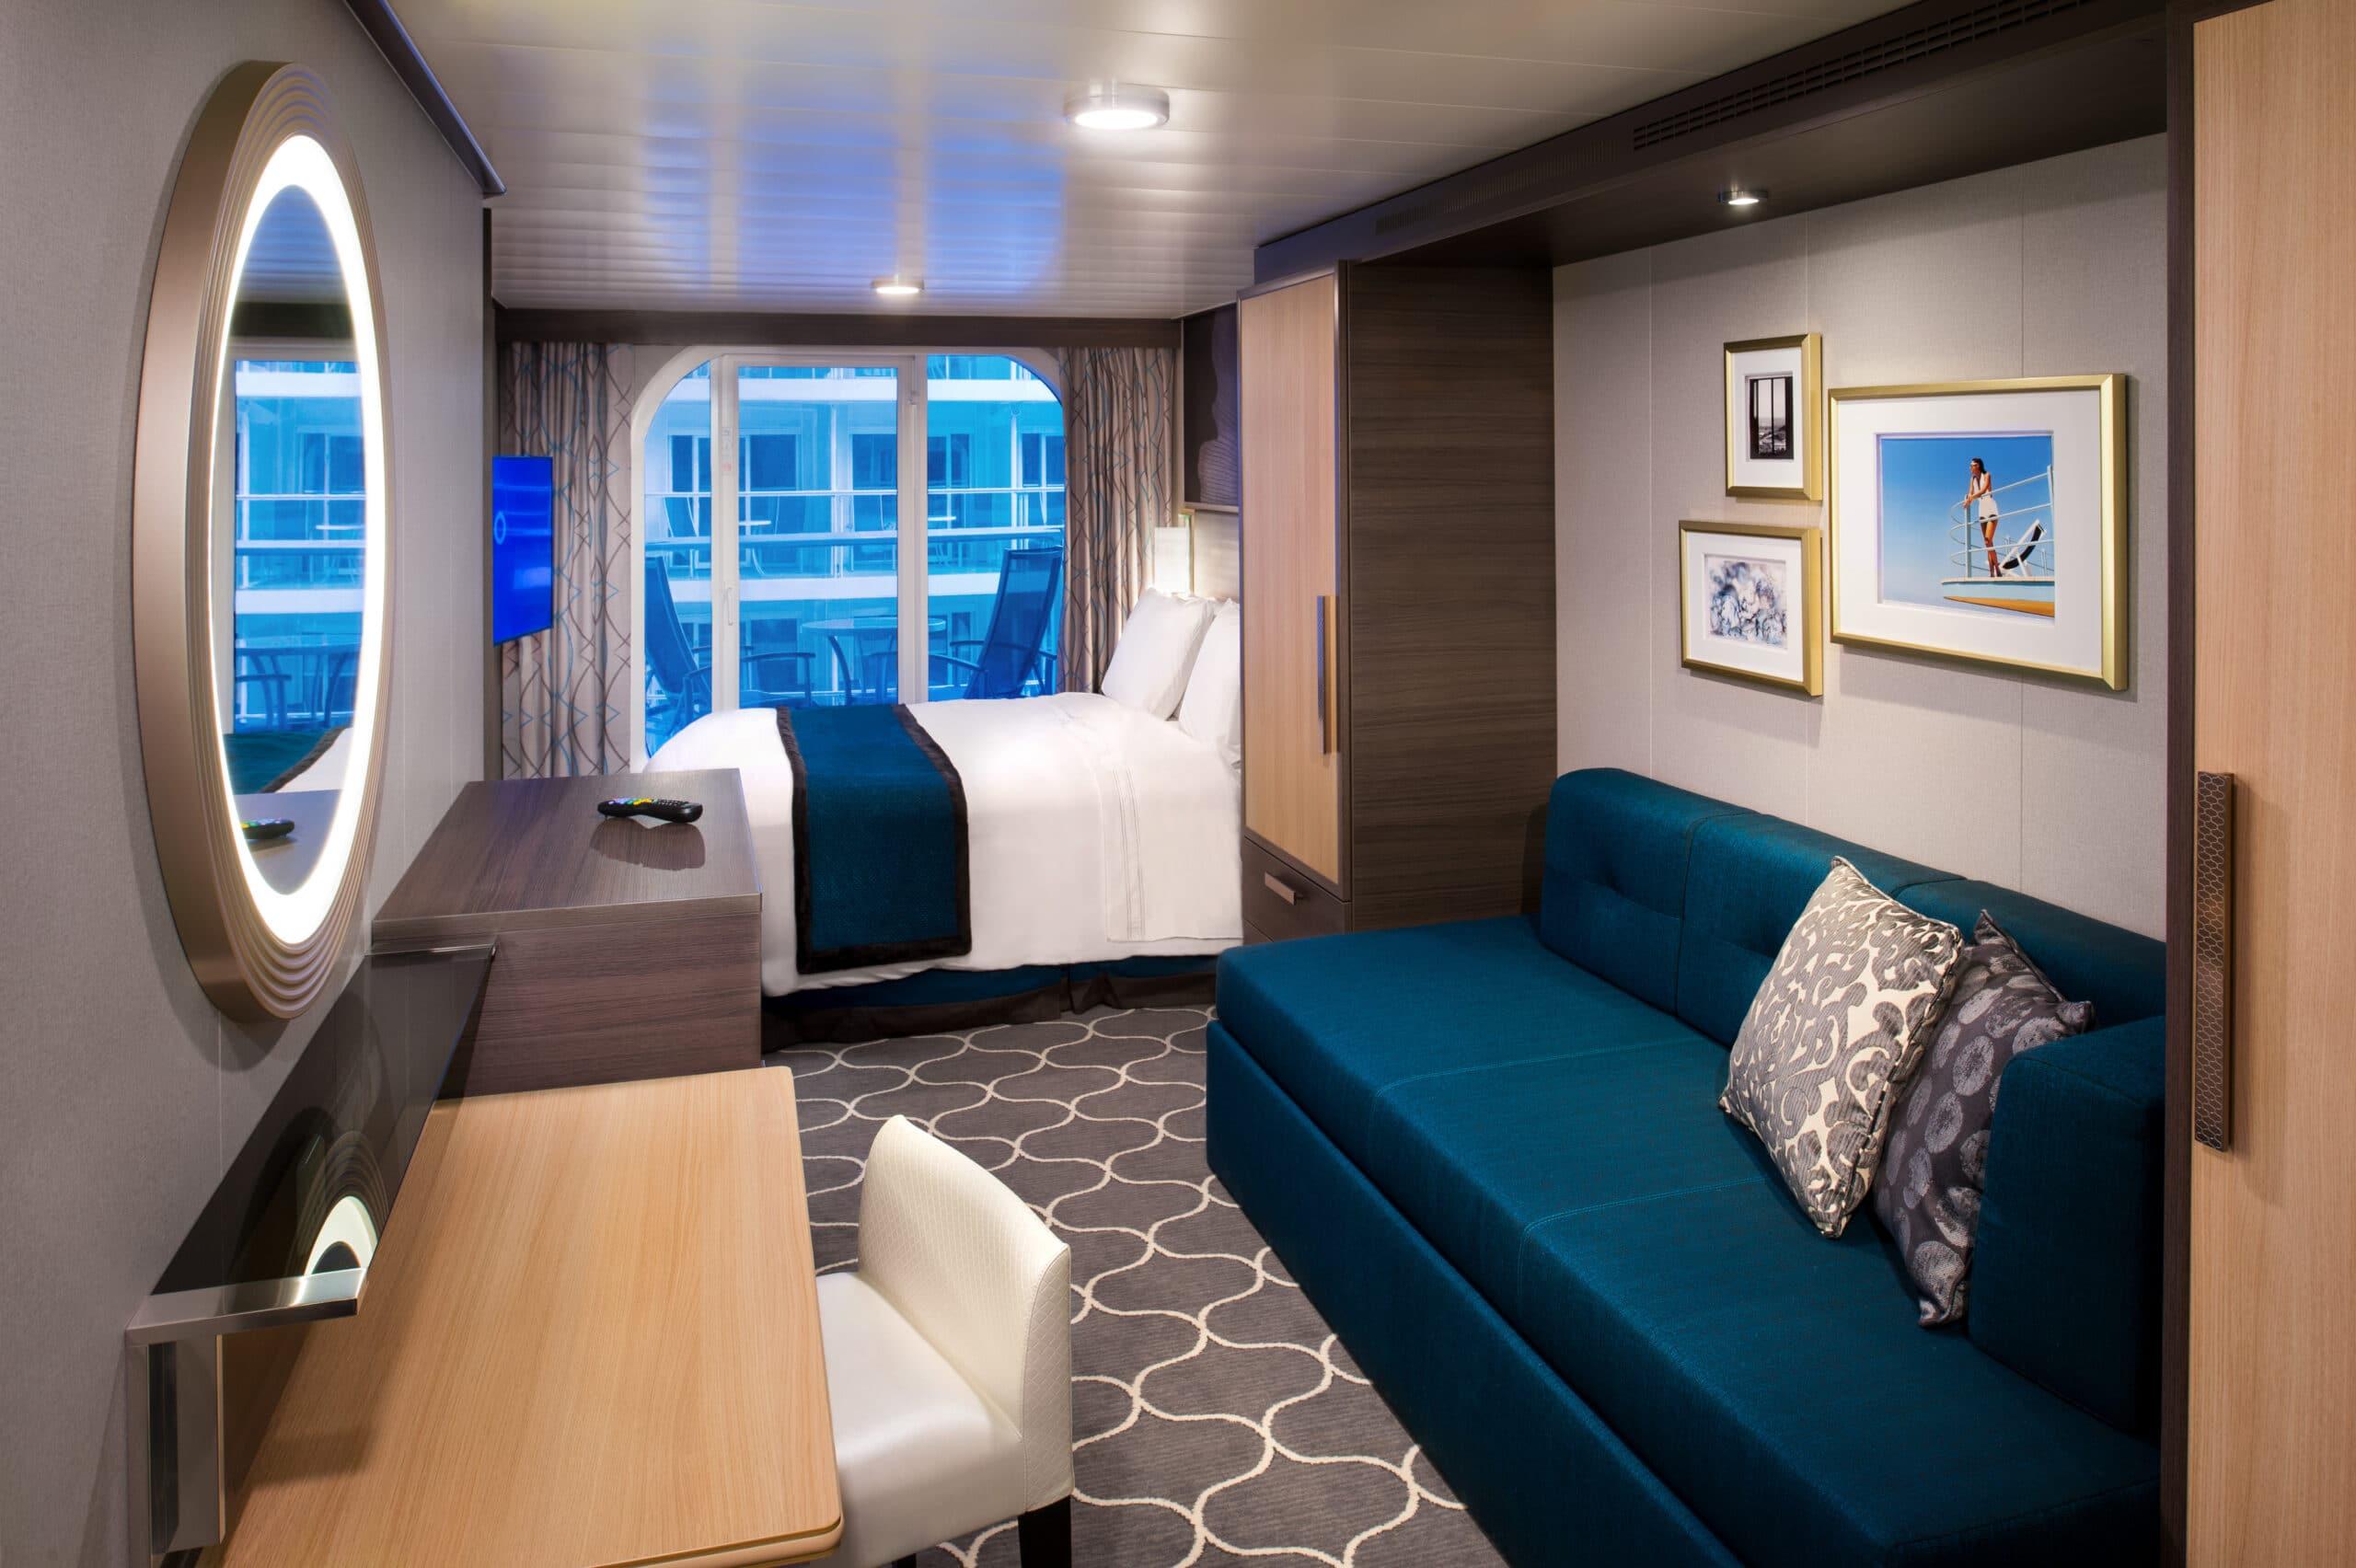 Royal-Caribbean-International-Harmony-of-the-Seas-Symphony-of-the-seas-schip-cruiseschip-categorie-1J-2J-balkonhut-central-park